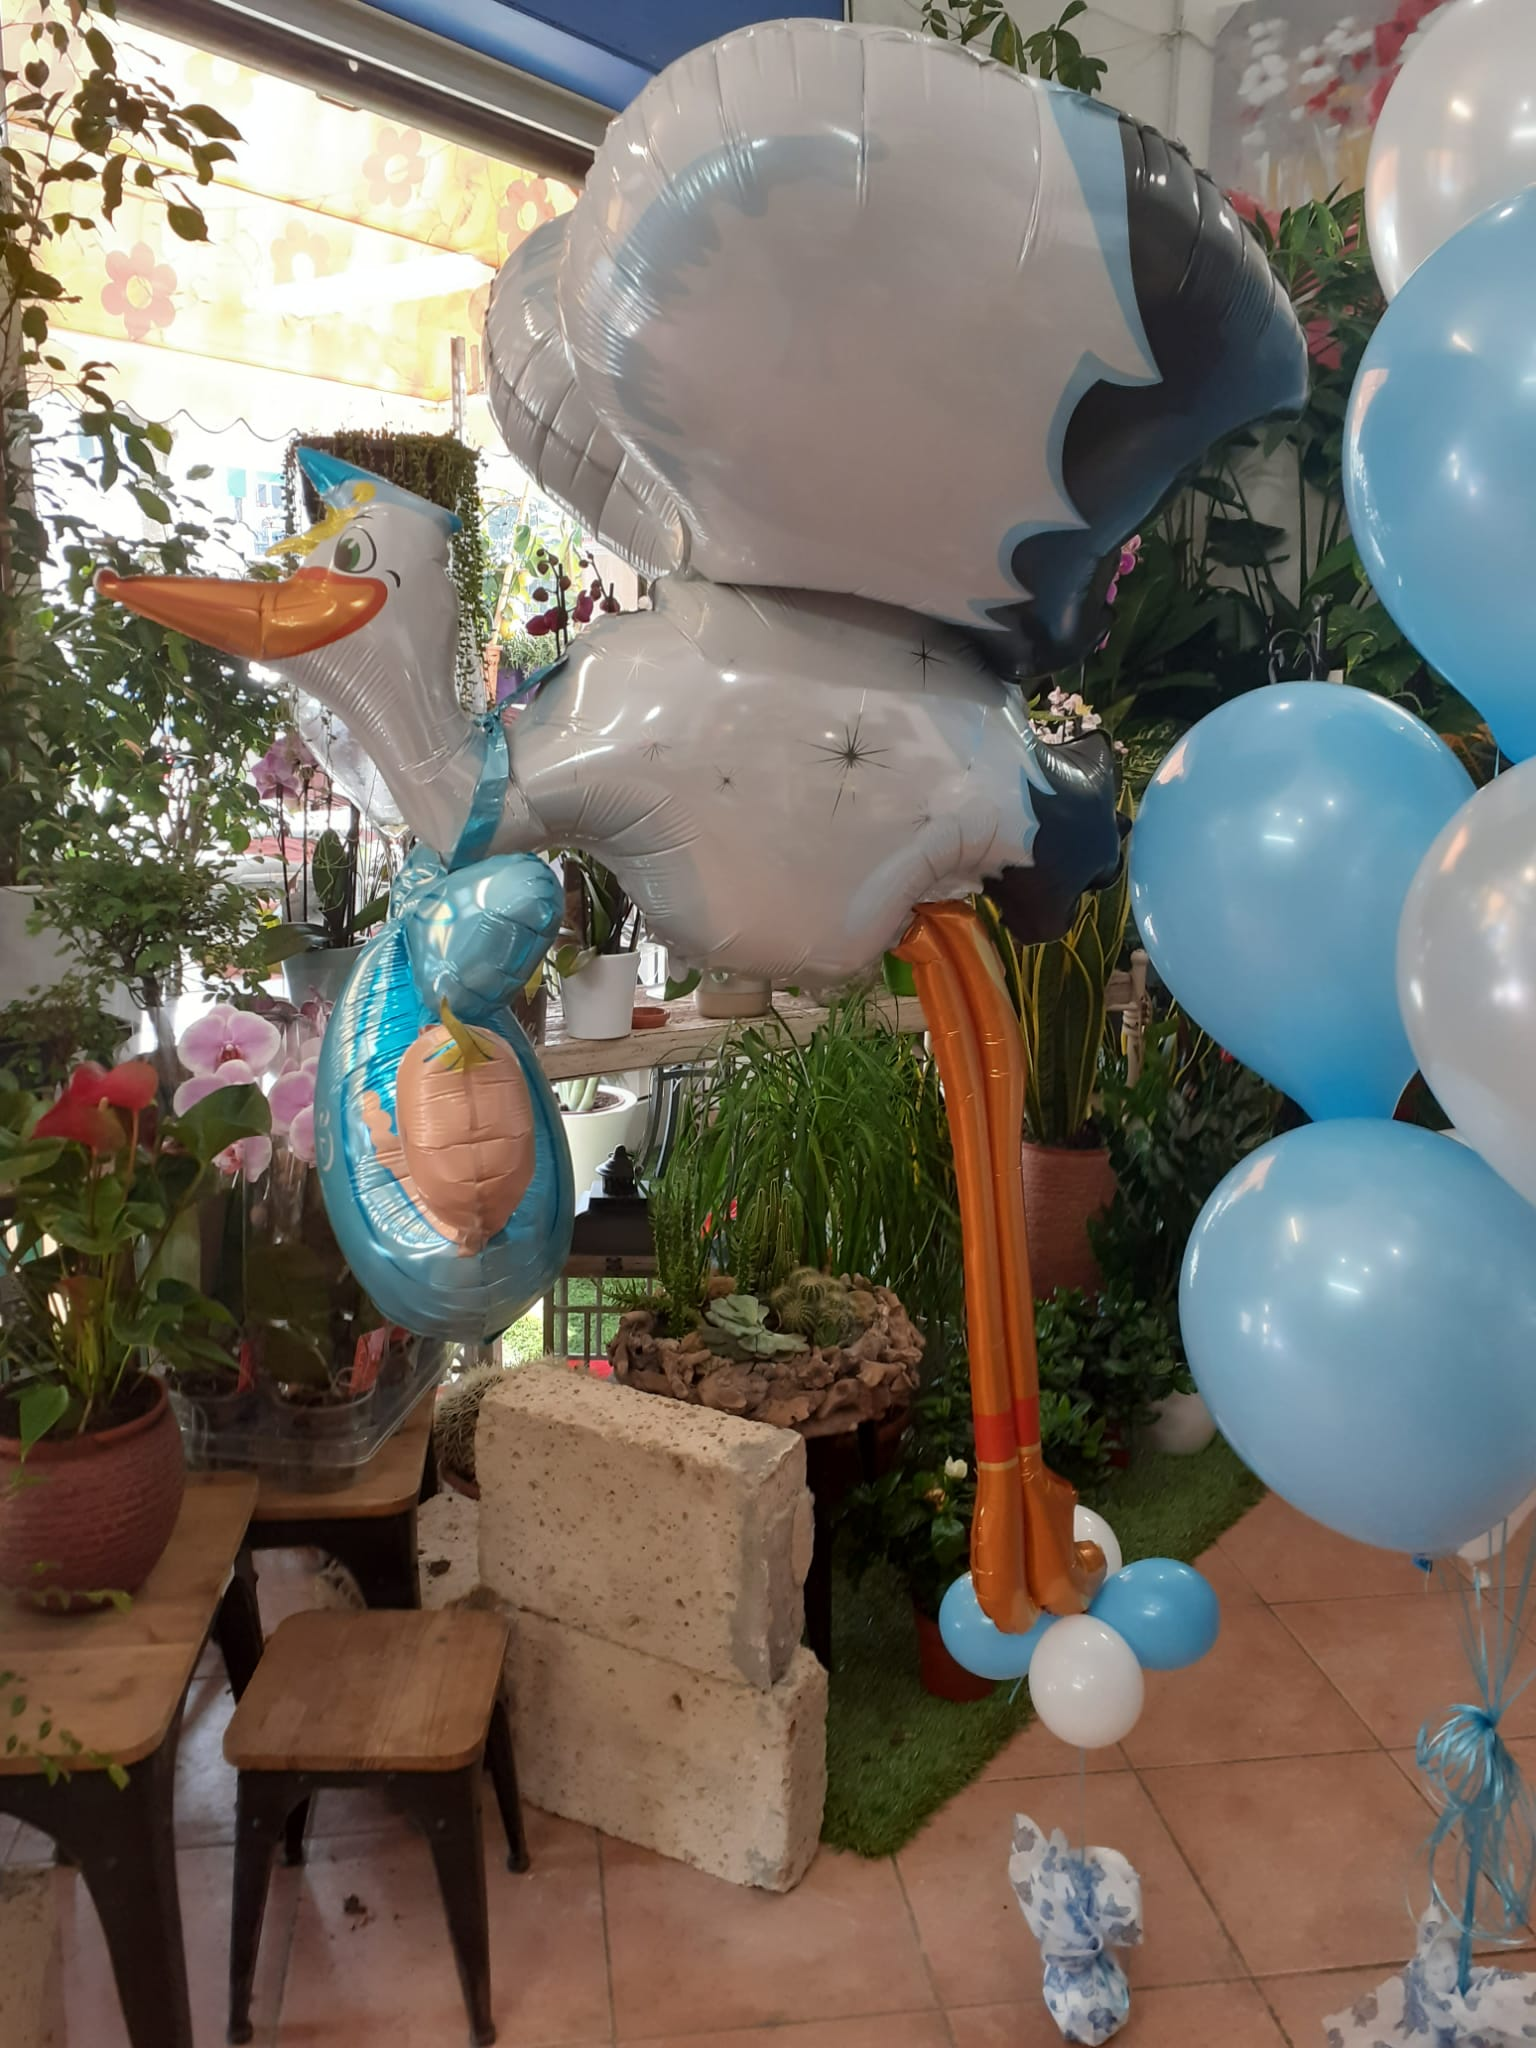 fiorista livorno balloon art